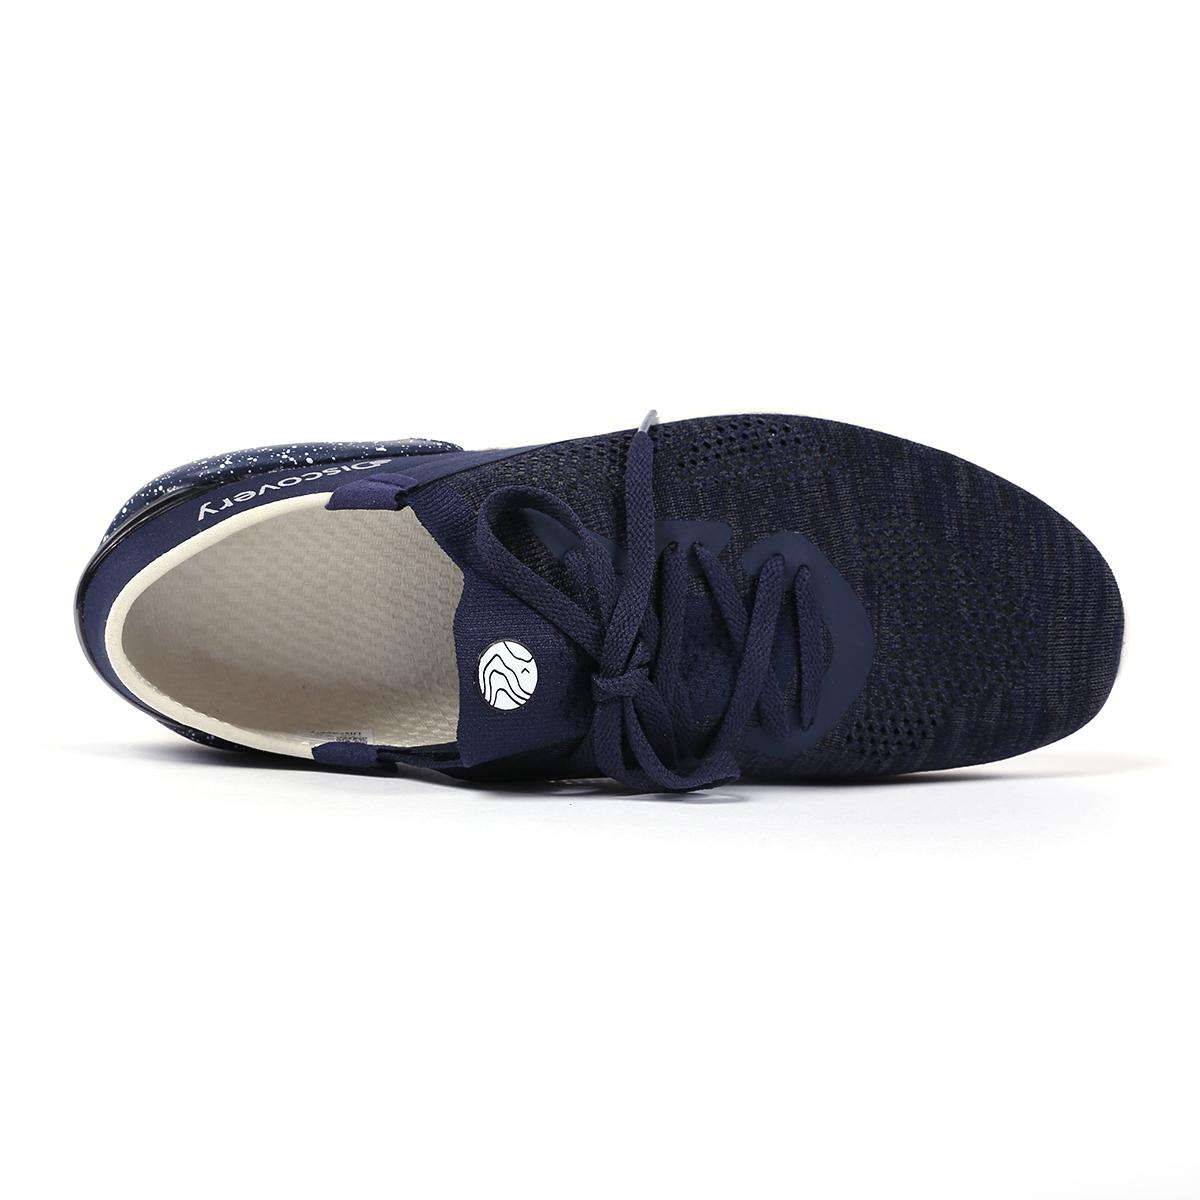 Discovery户外2018春夏新品男式休闲鞋DFMG81042